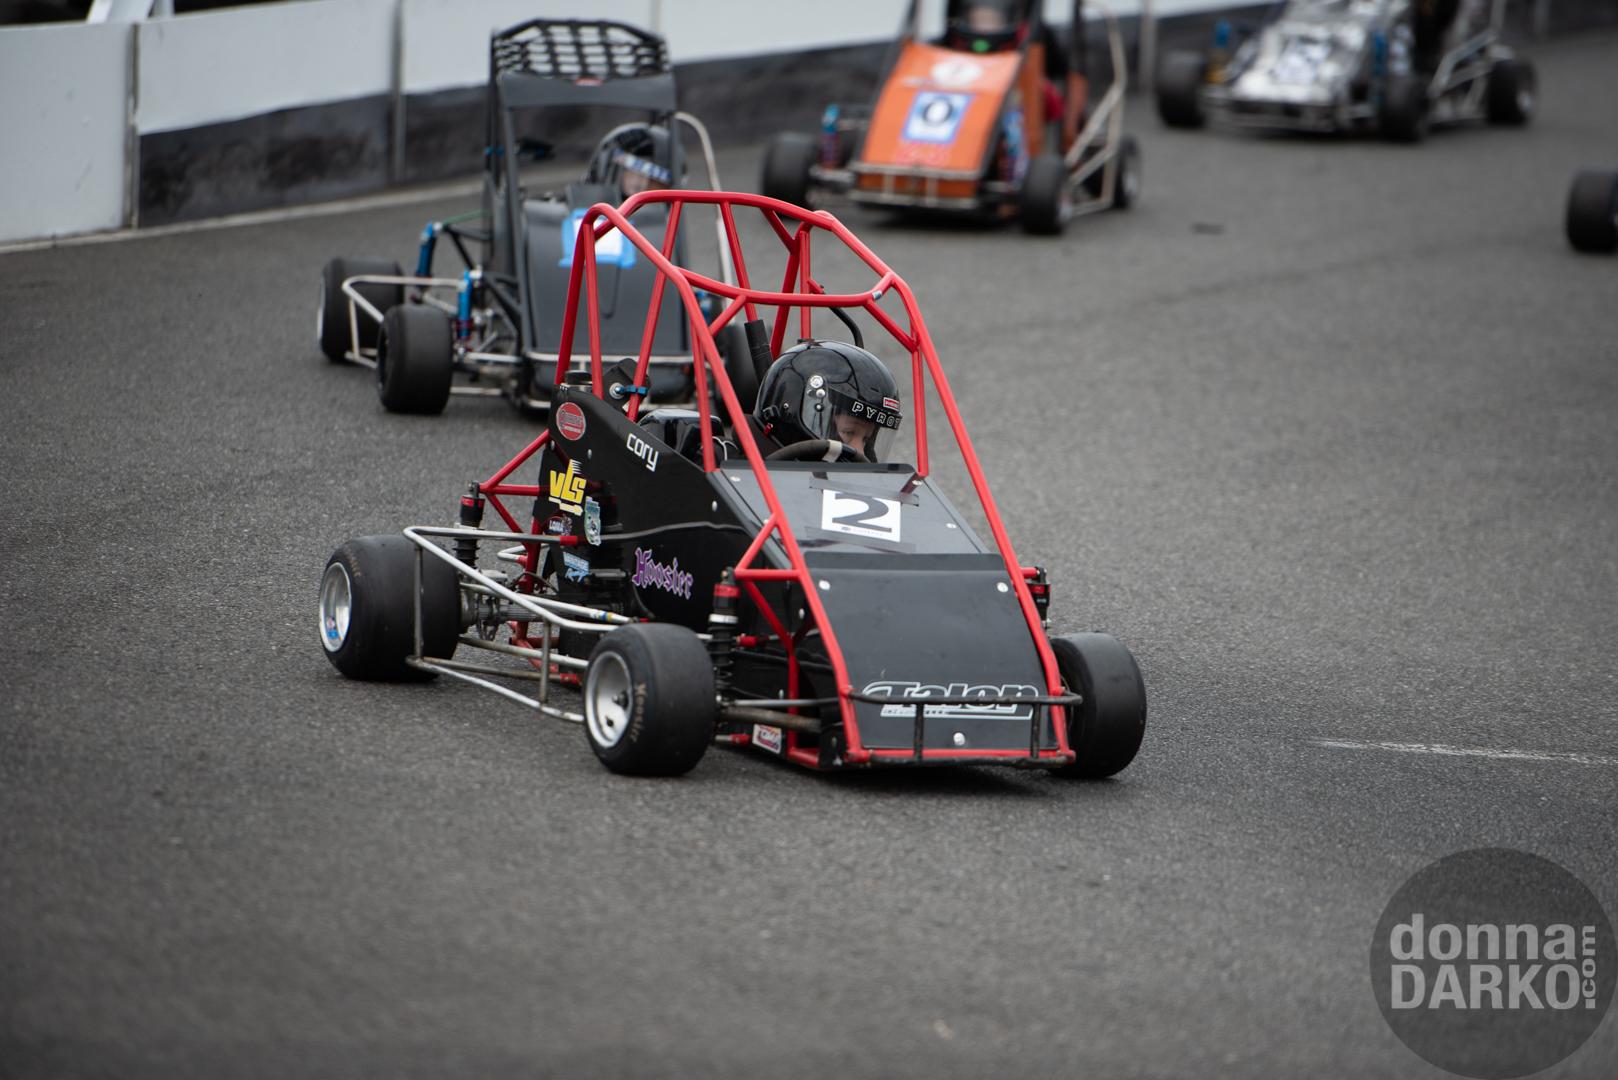 QWMA (Racing) 8-11-2019 DSC_6016.jpg